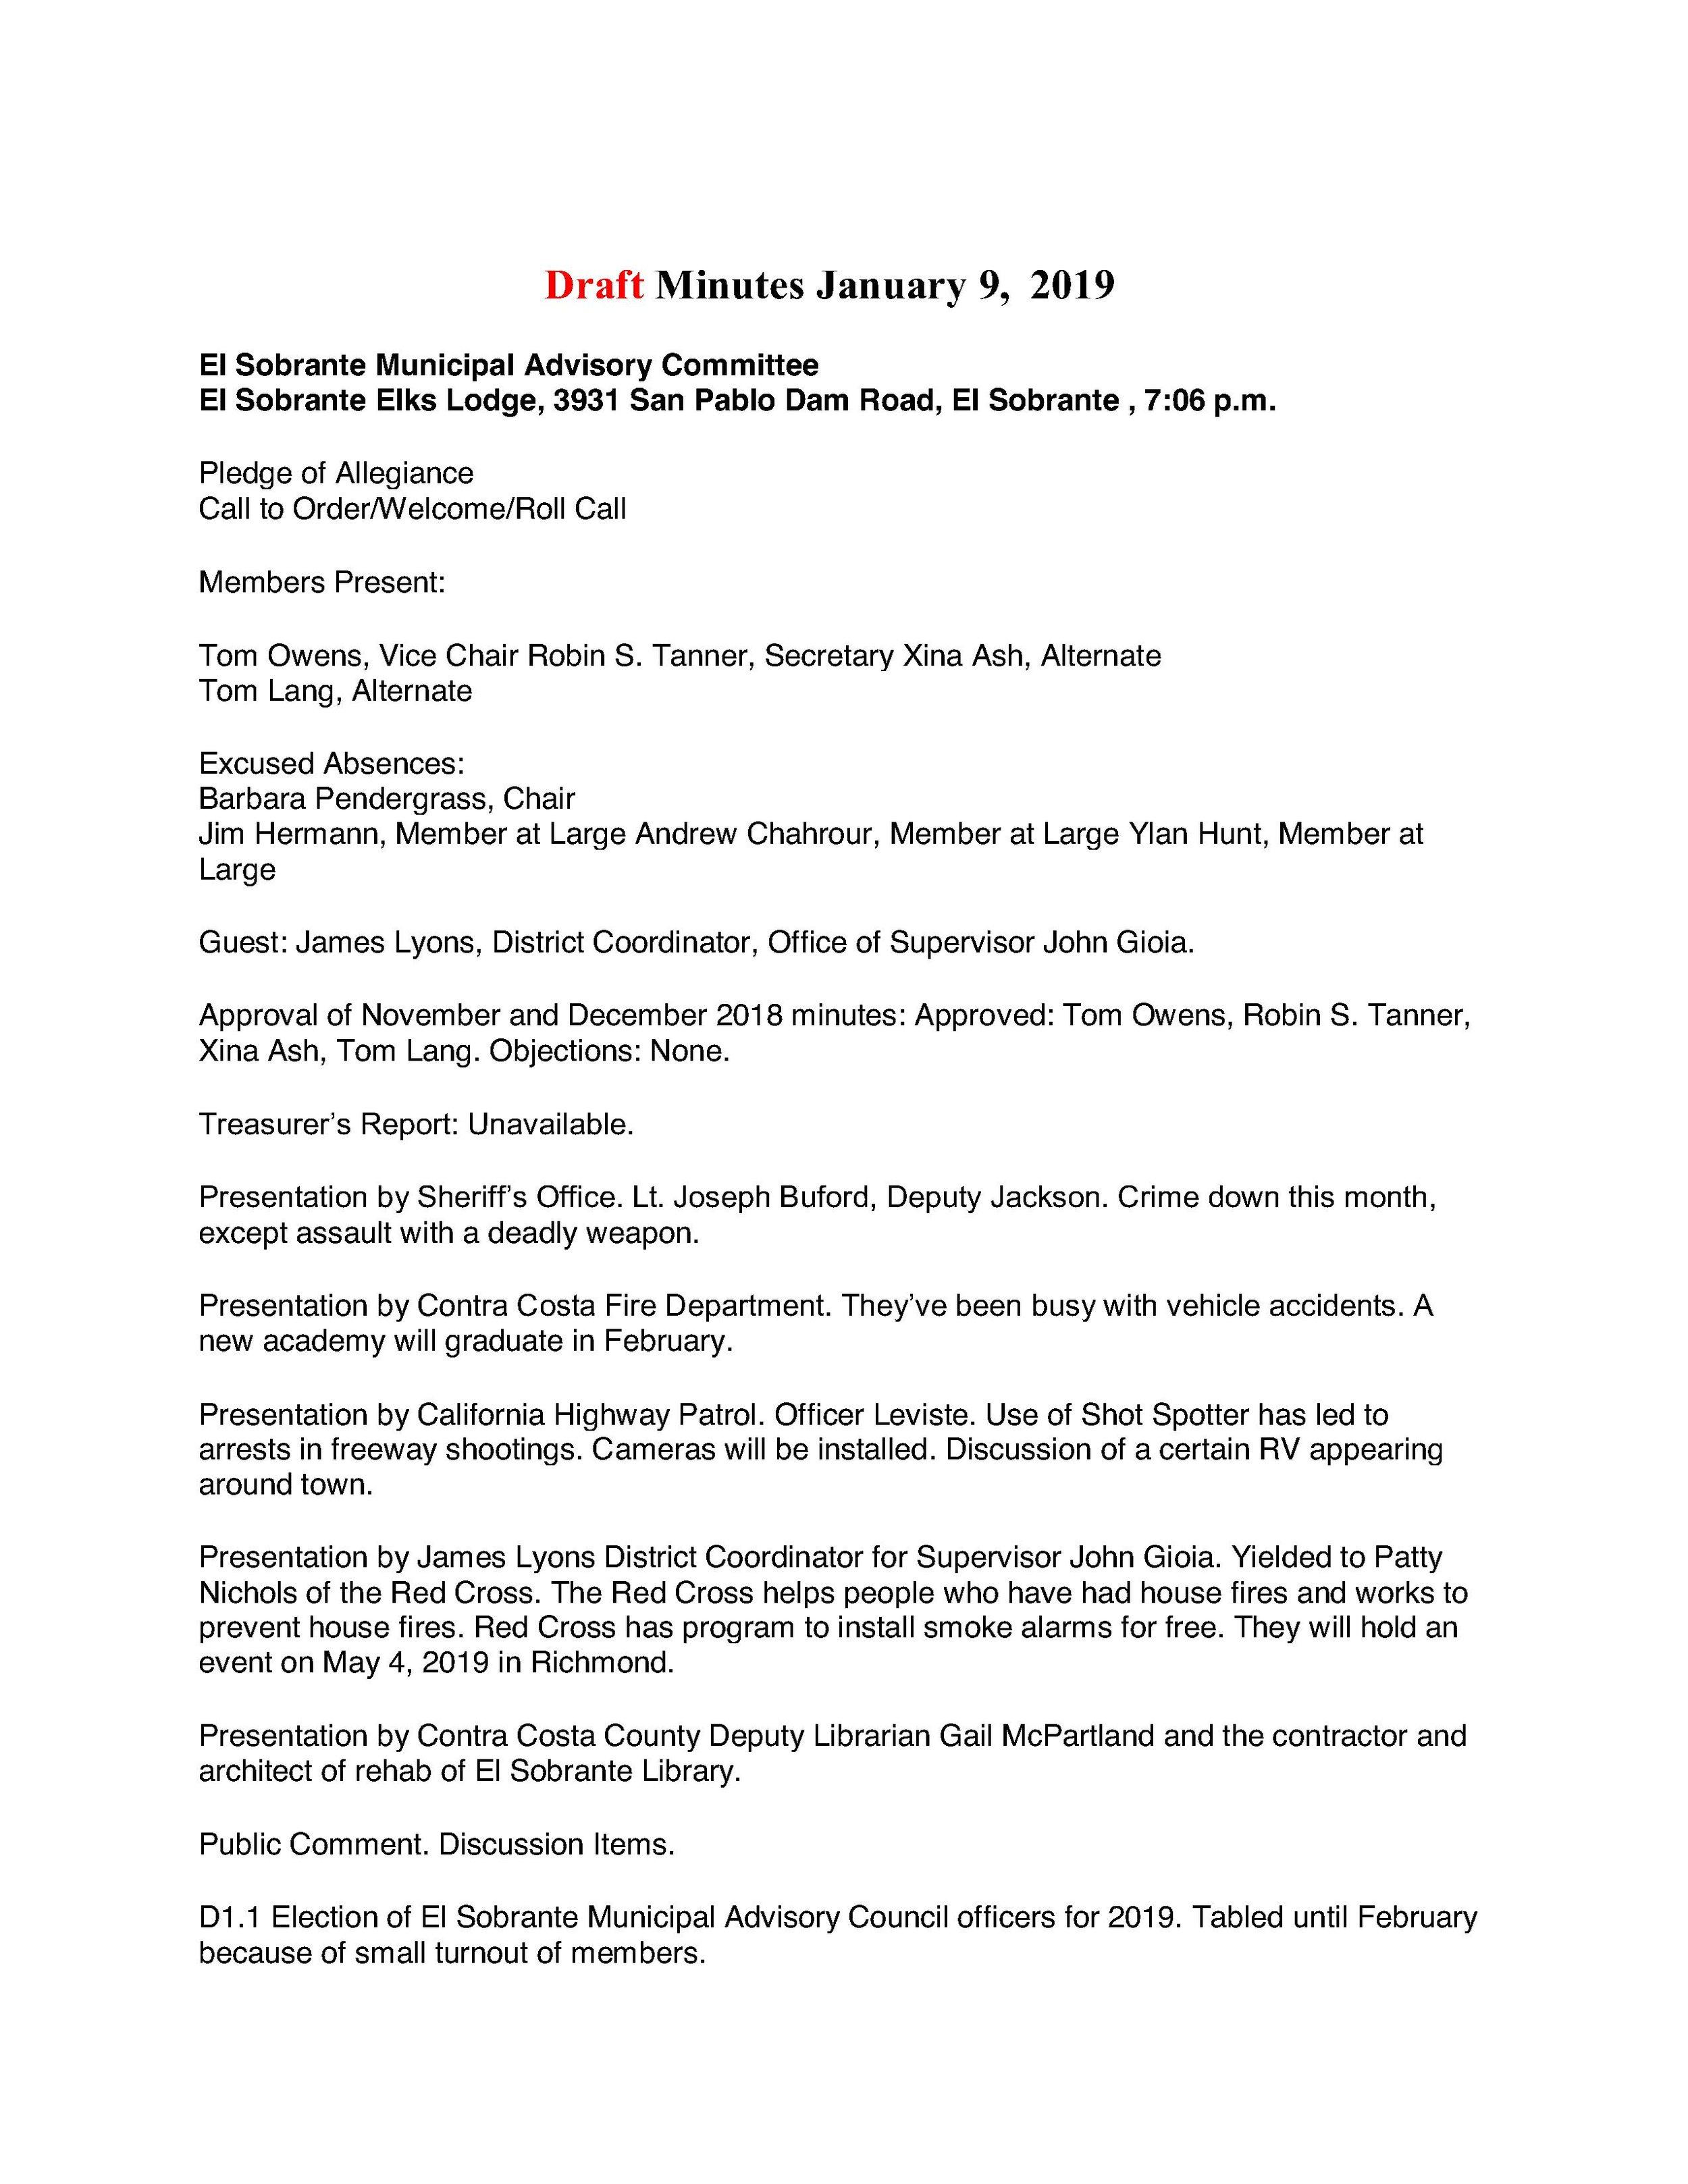 ESMAC Agenda 2.13.2019b_3.jpg